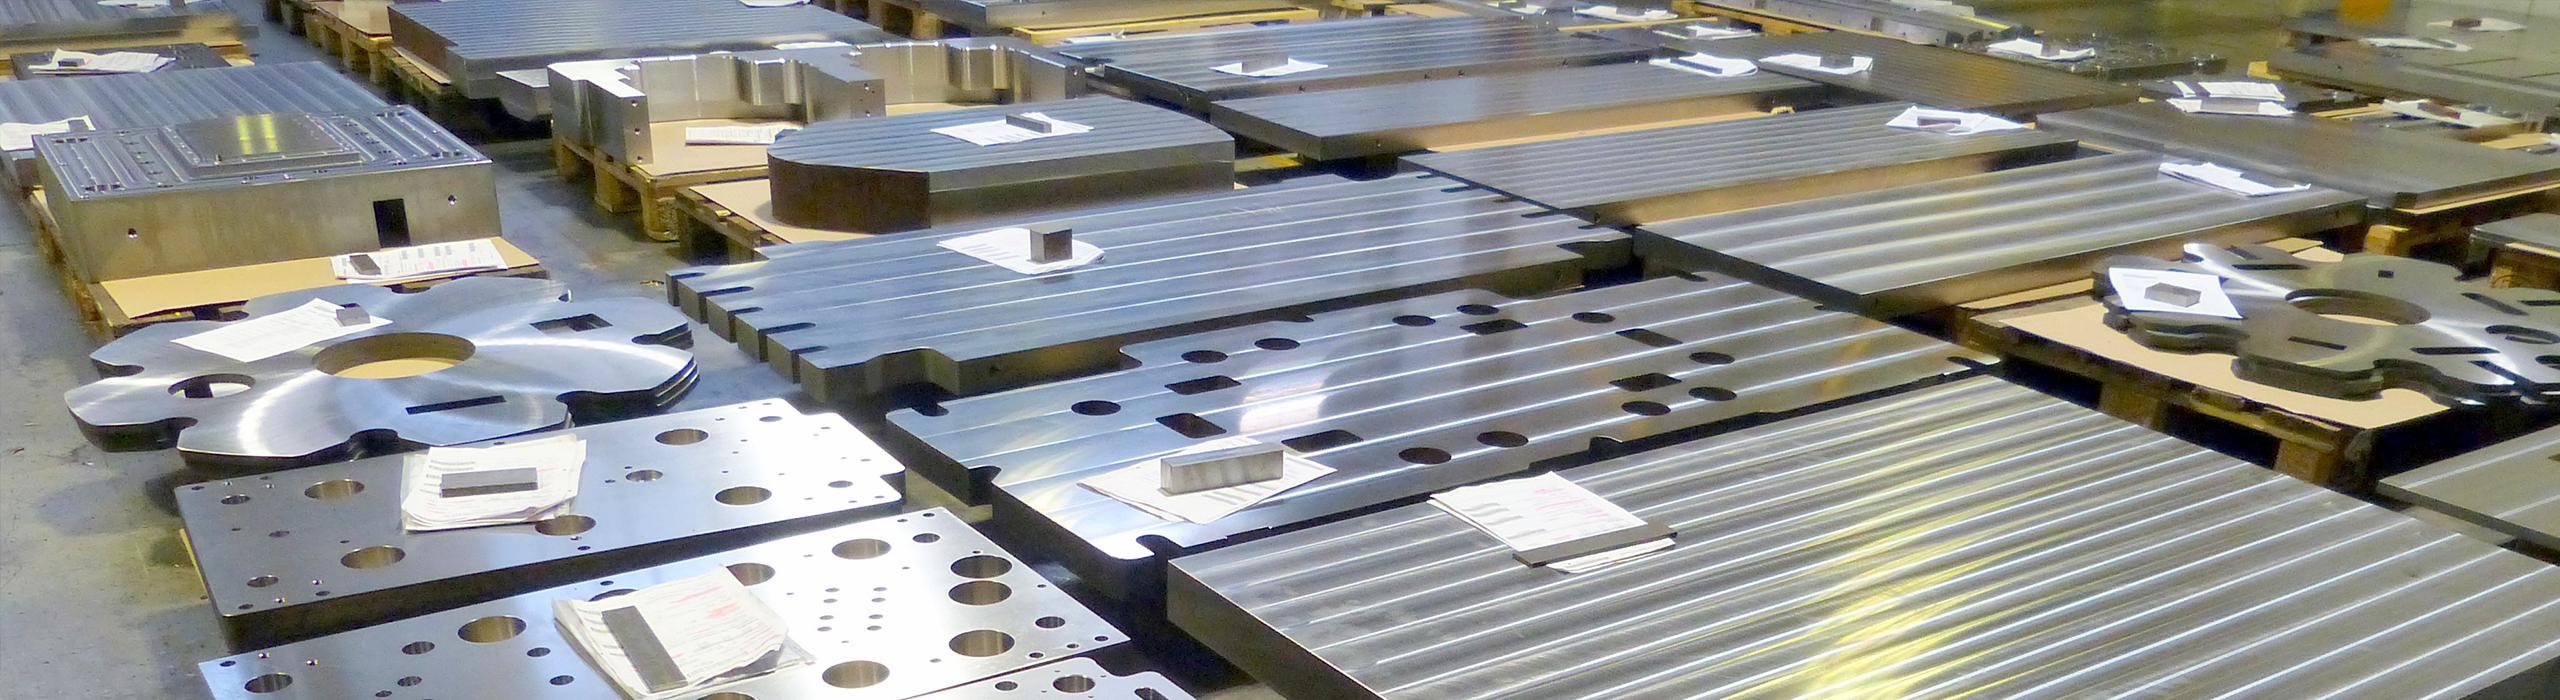 RSB-Stahl-maschinenbau-header2